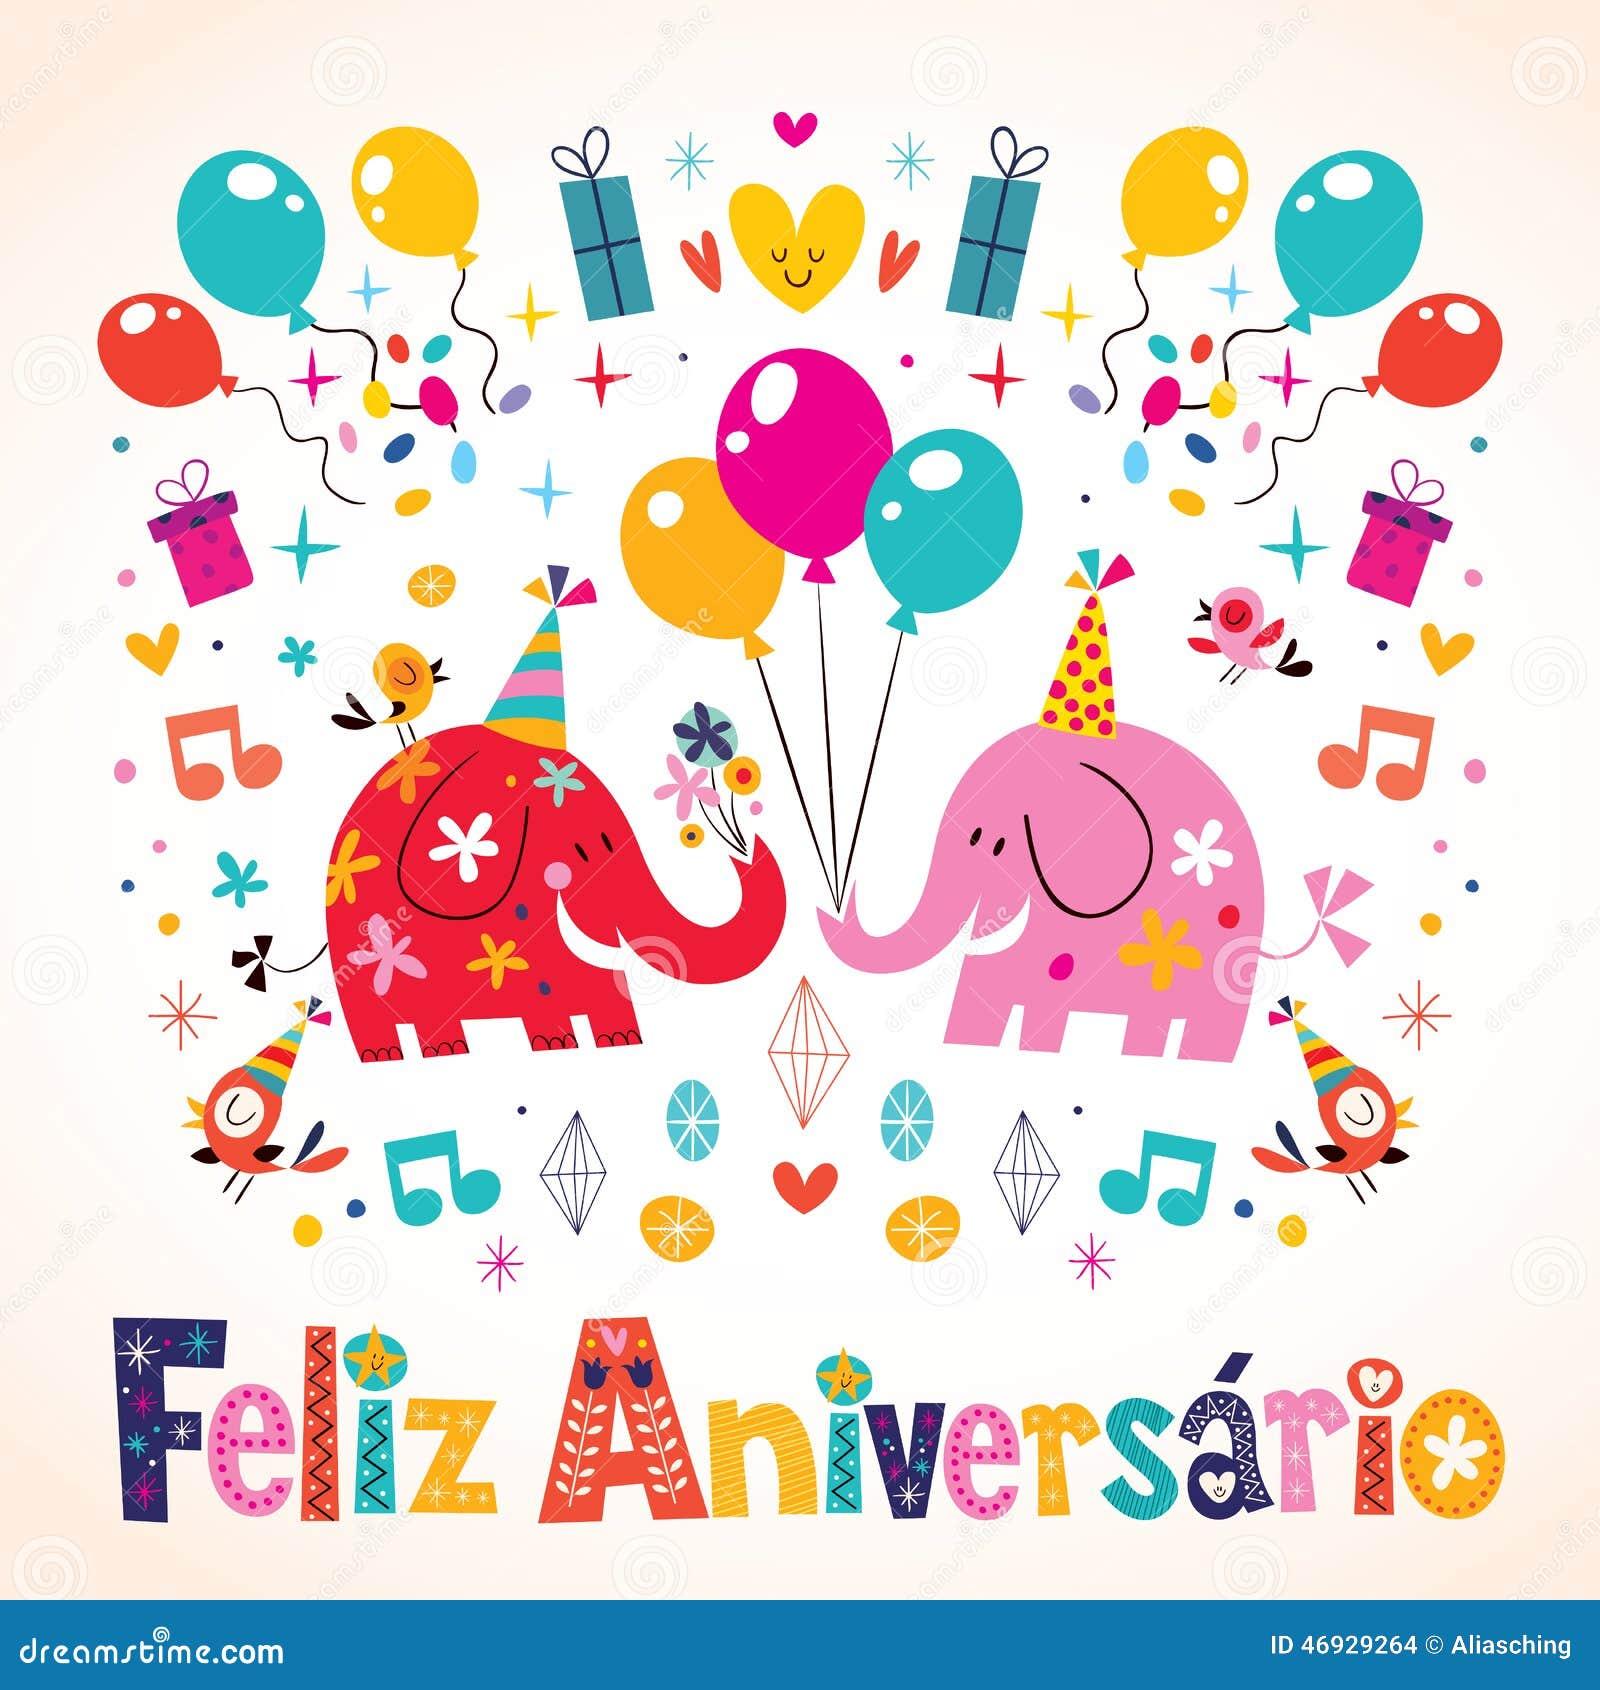 feliz aniversario portuguese happy birthday card stock credit card clipart black and white credit card clip art images